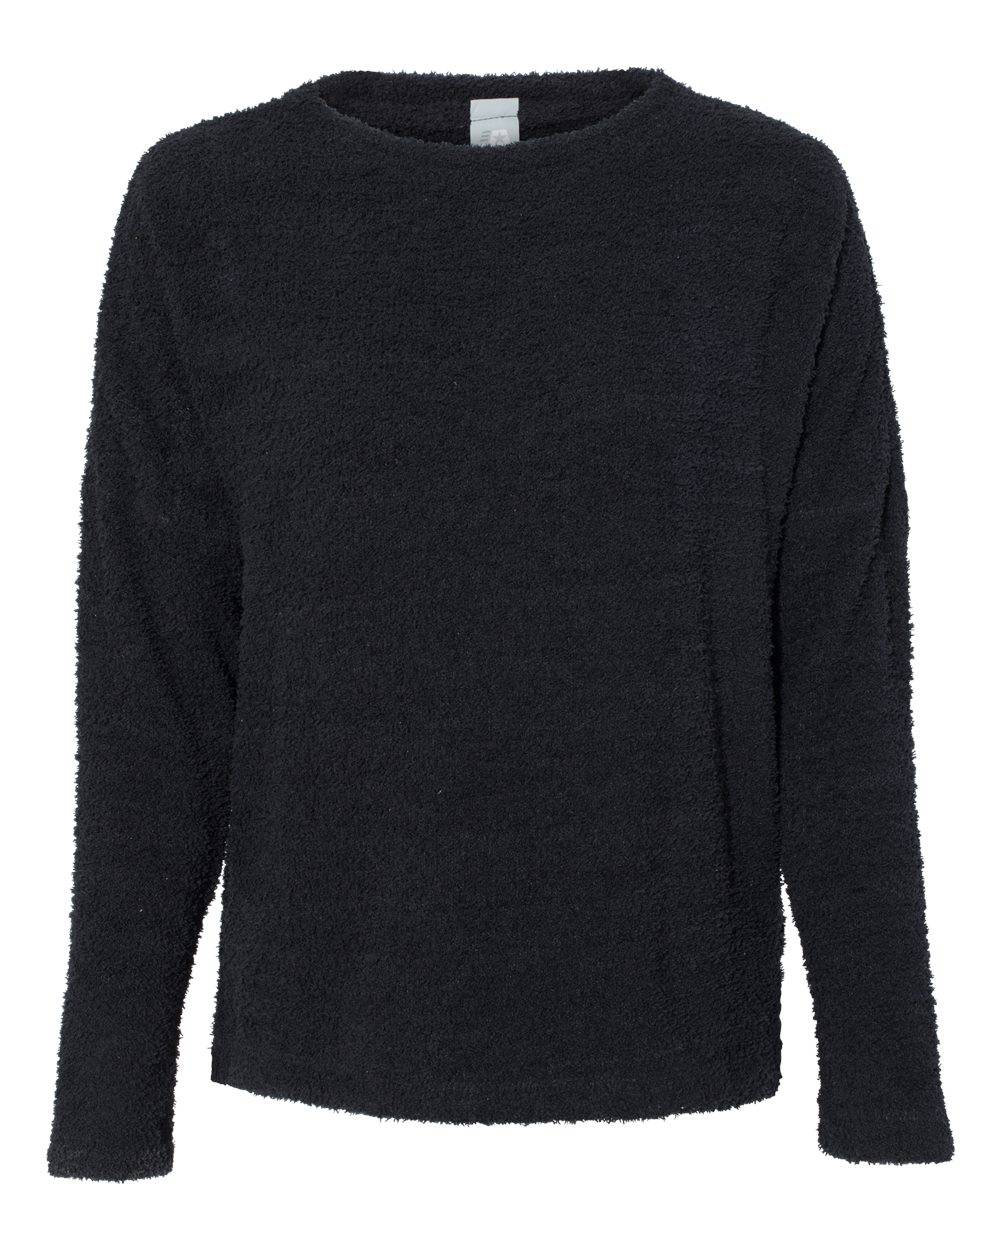 J. America - Womens Teddy Fleece Crewneck Pullover - 8681 - Black - Large